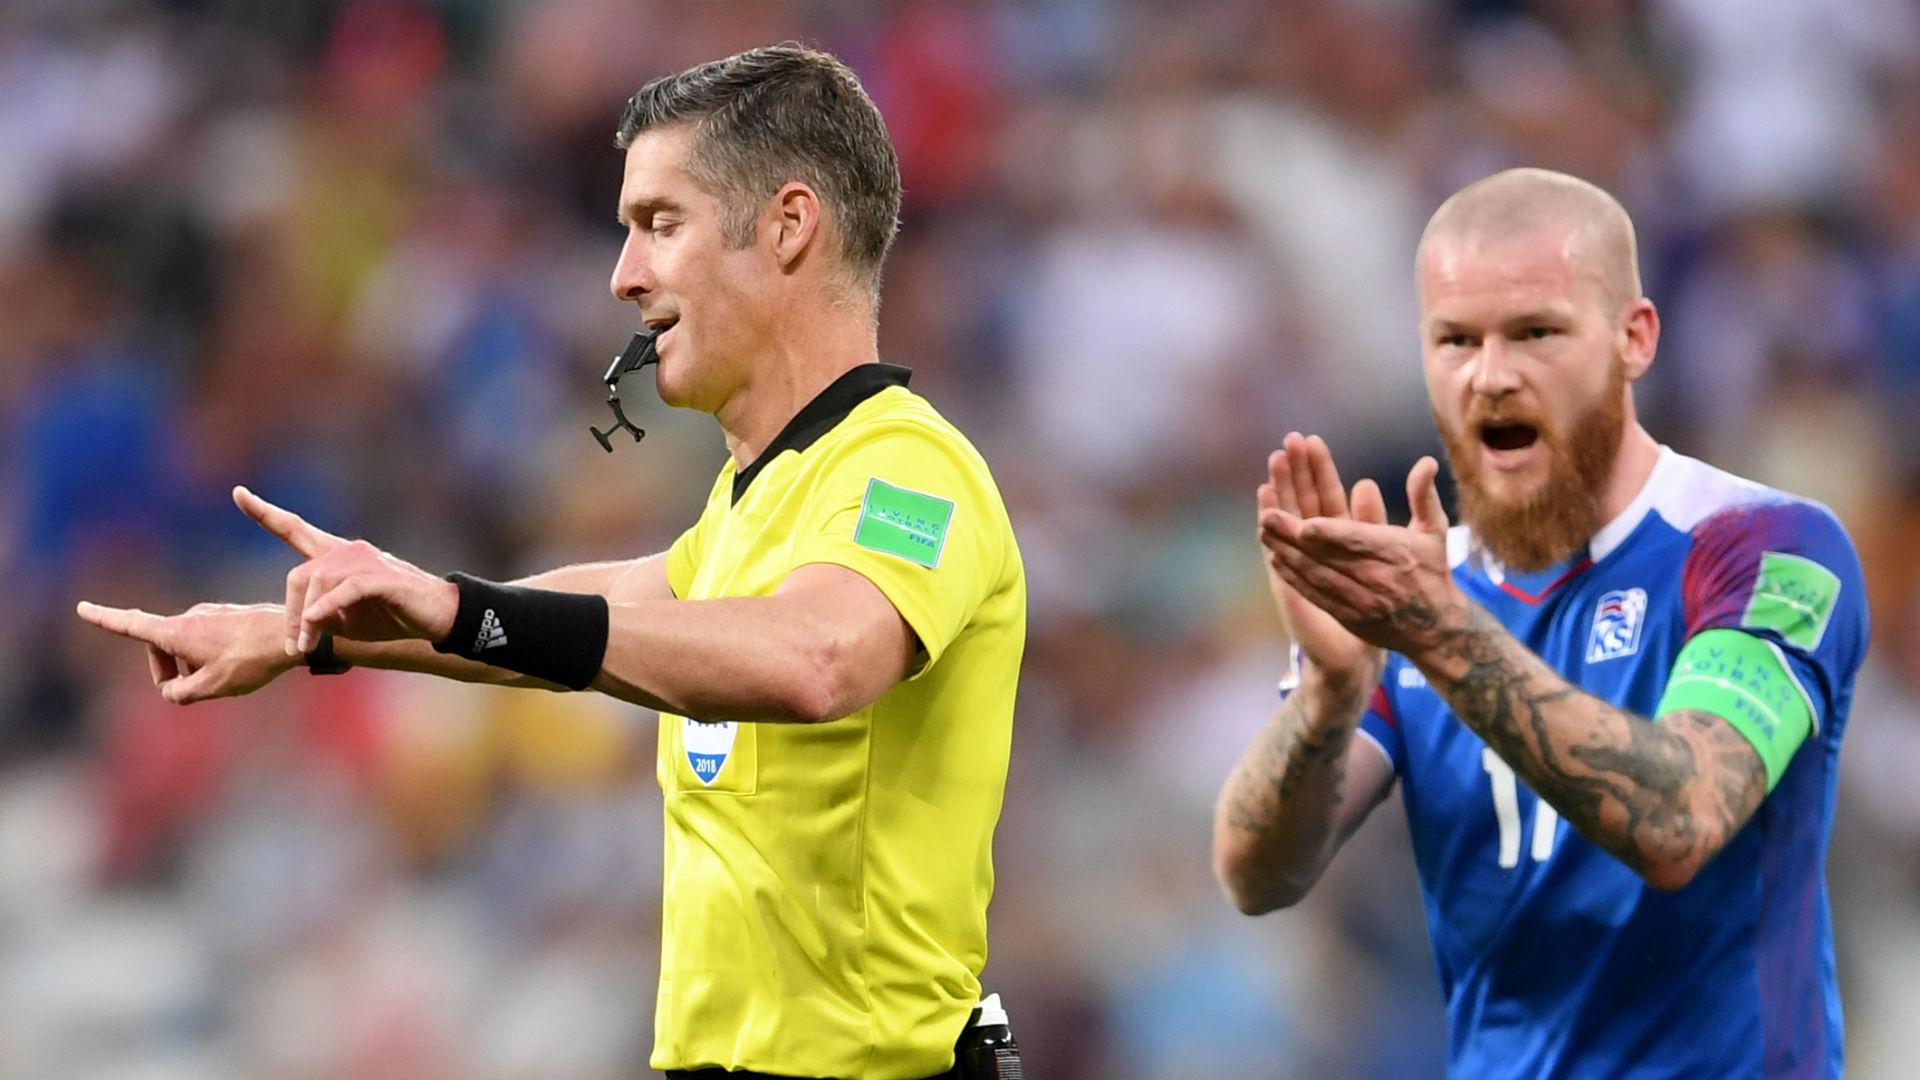 Matthew Conger Iceland Nigeria World Cup 2018